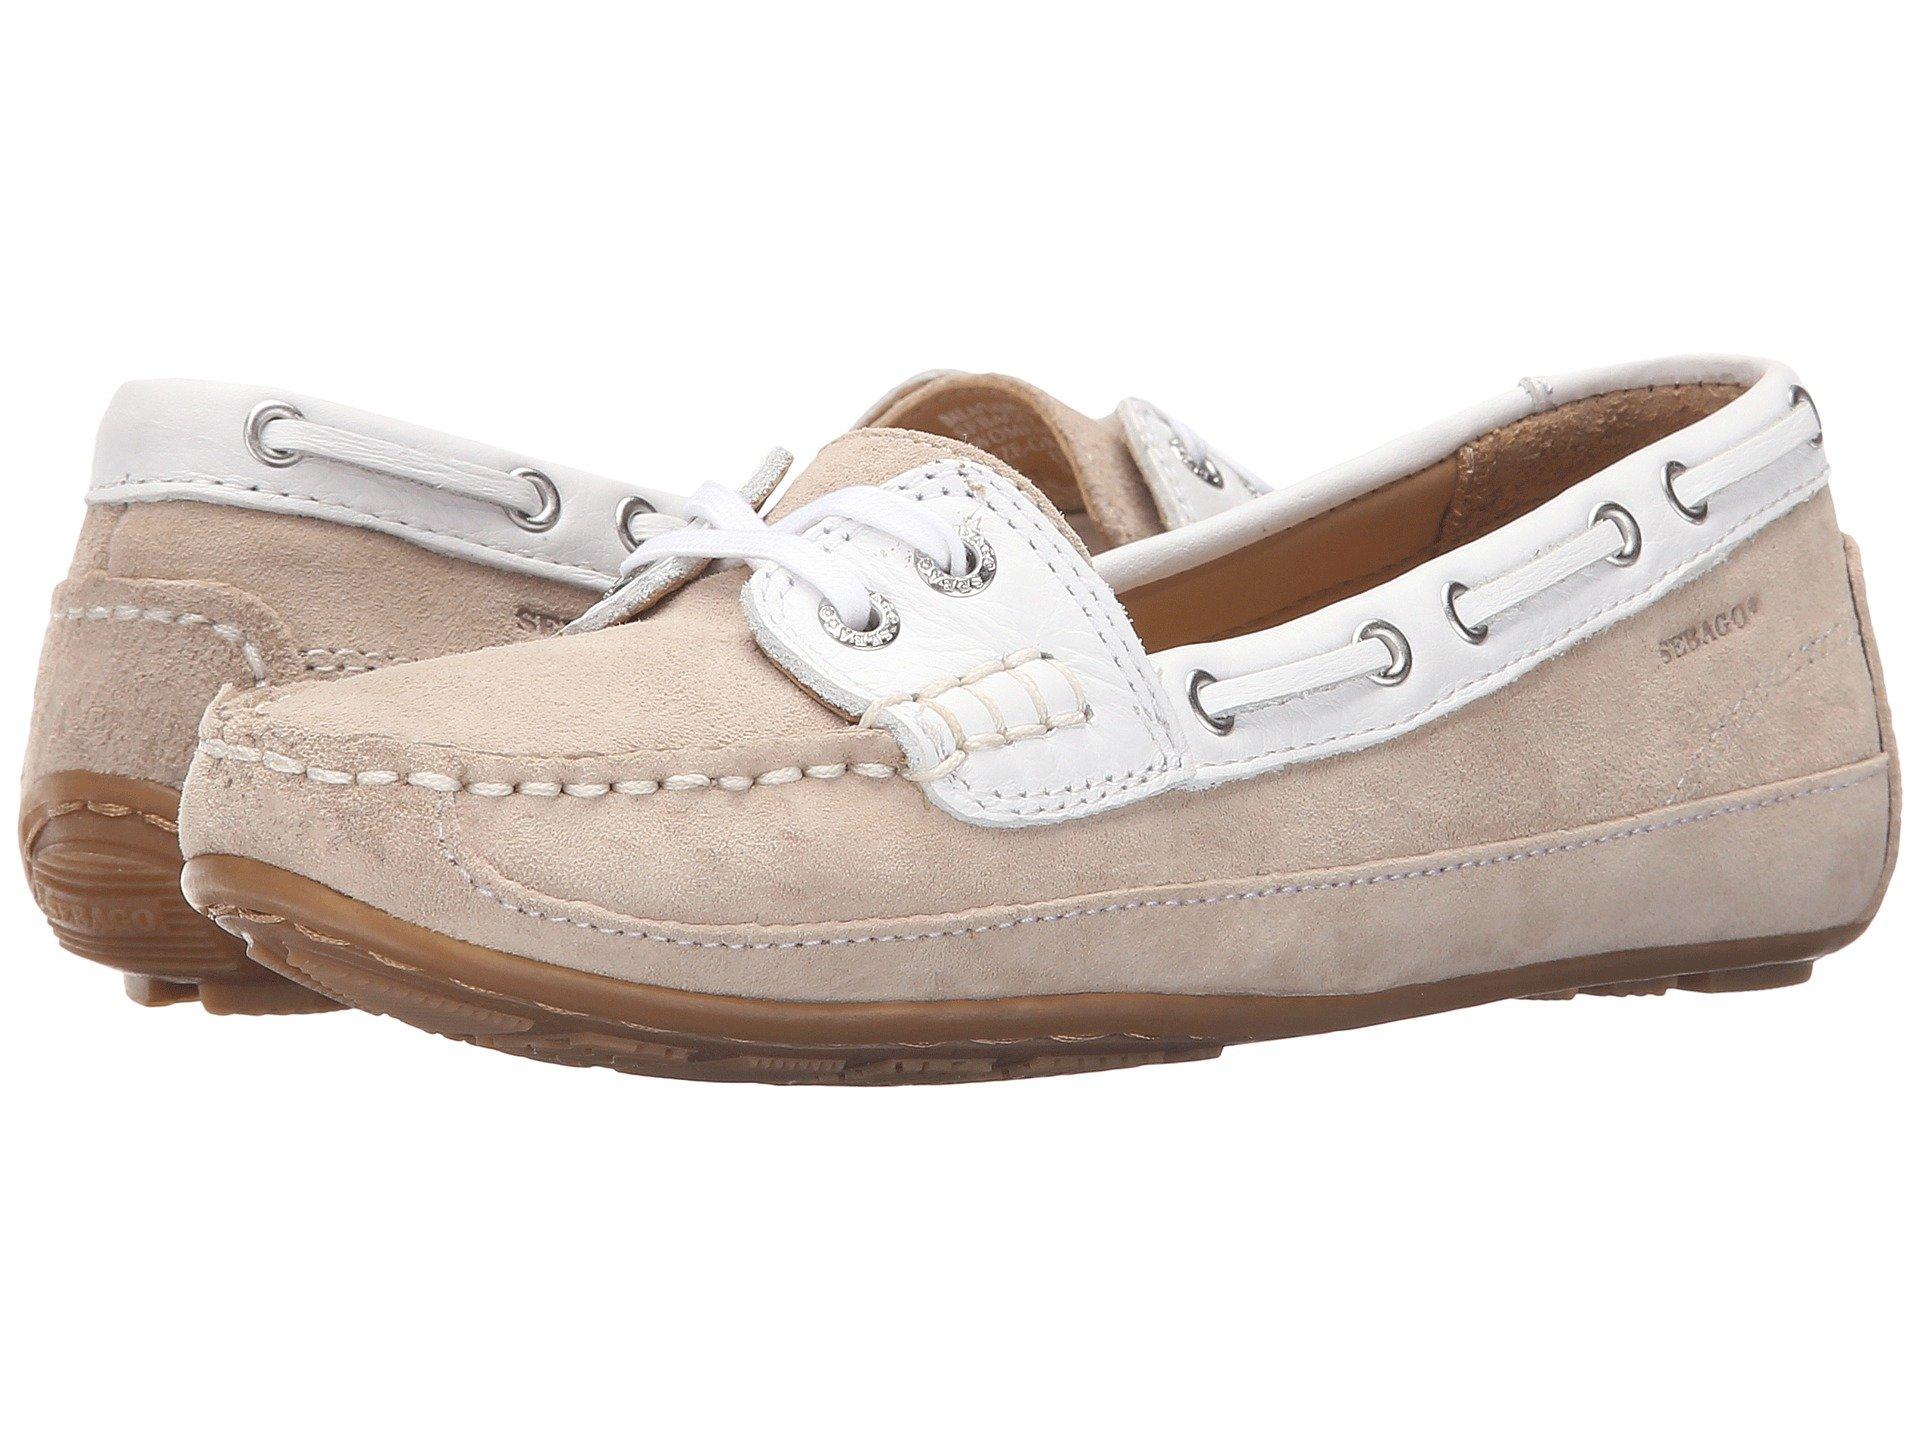 ee82a35e5bd Women s Sebago Shoes + FREE SHIPPING